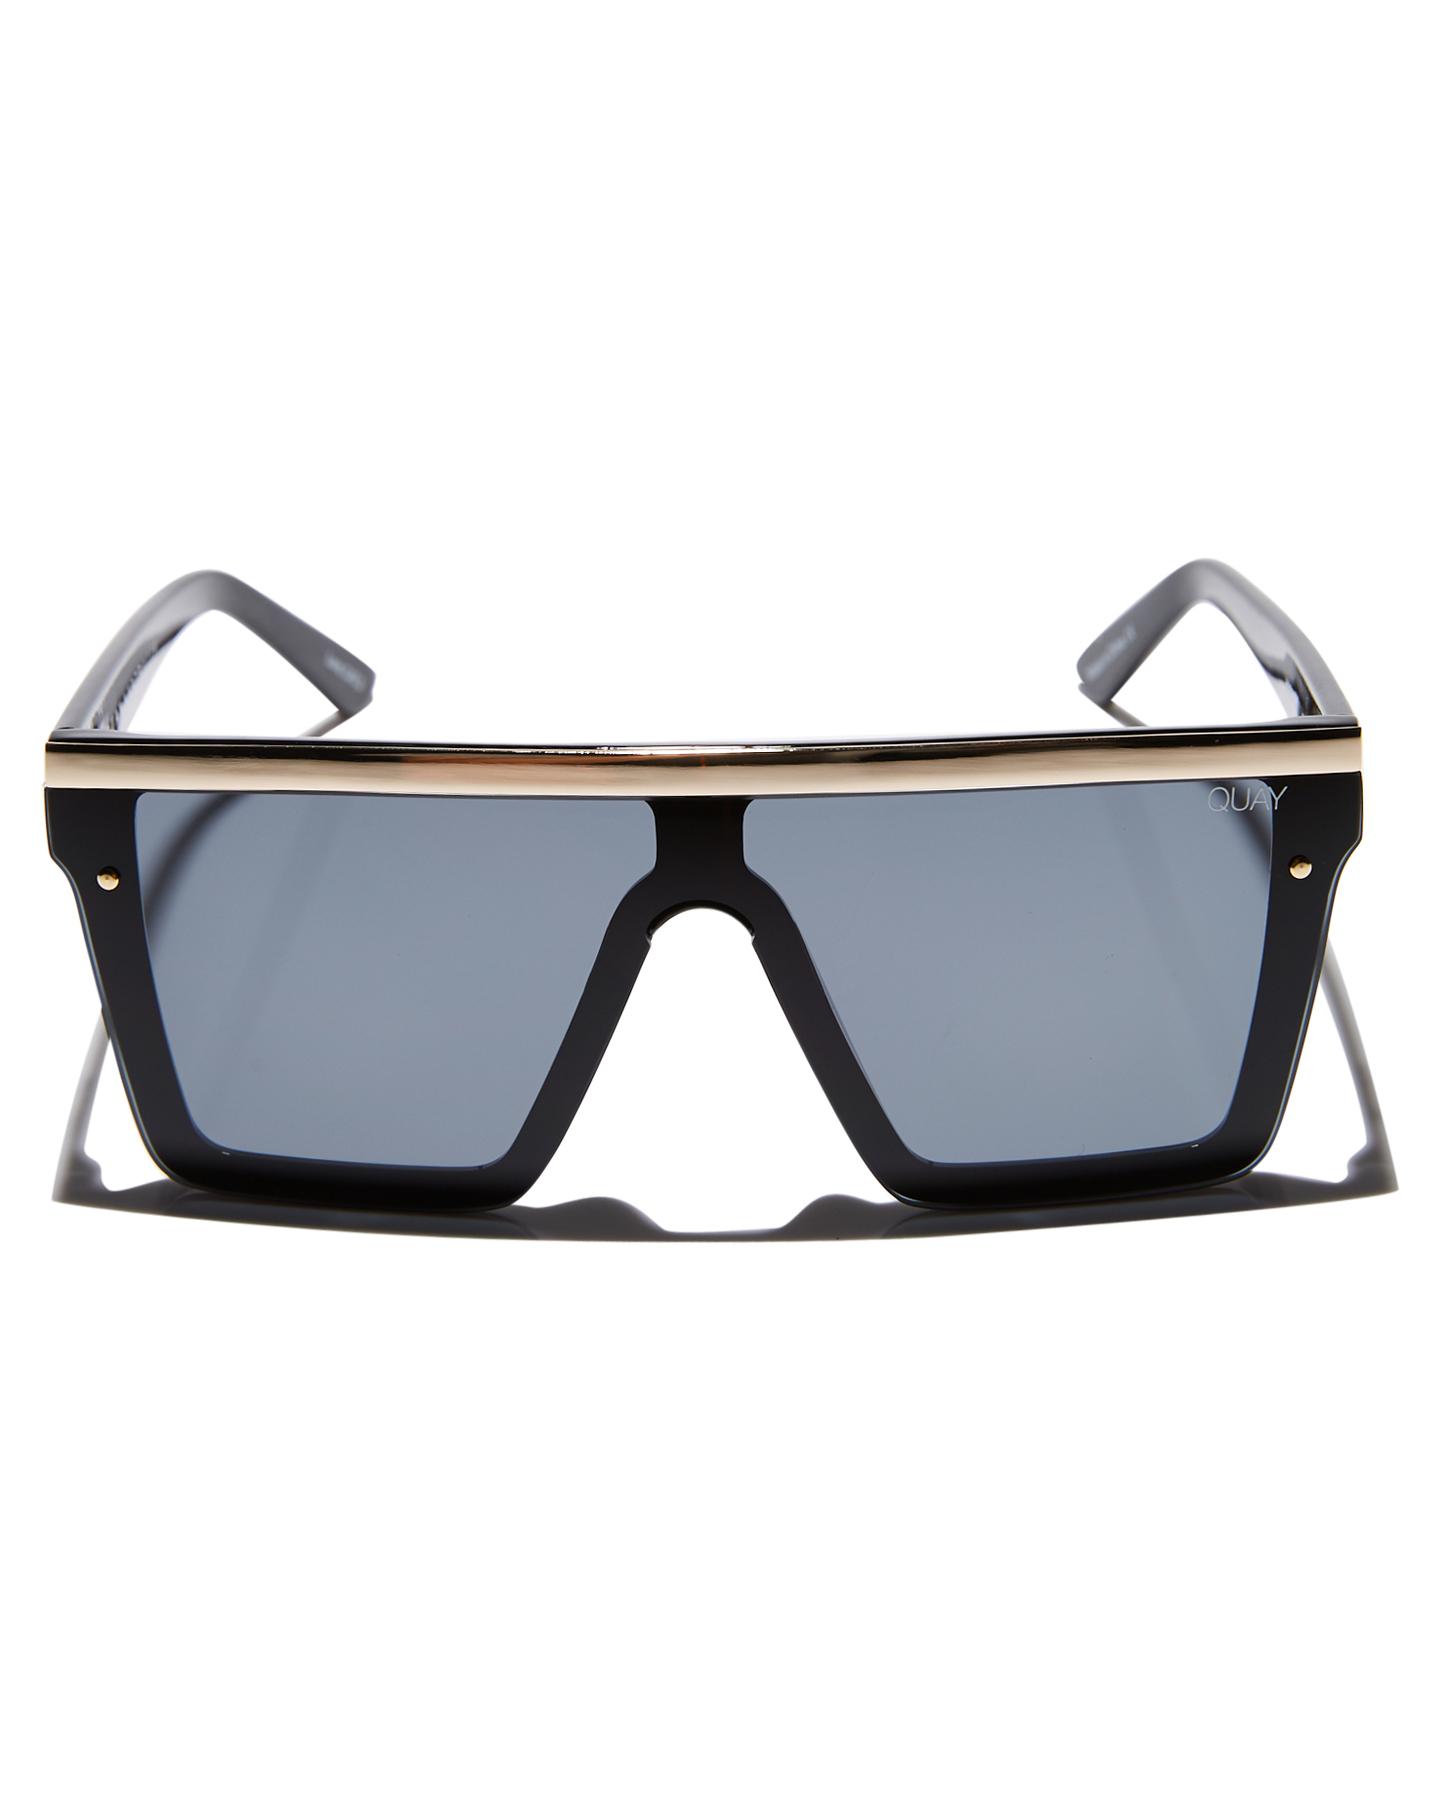 New-Quay-Eyewear-Women-039-s-Hindsight-Sunglasses-Stainless-Steel-Glass-Pink thumbnail 7